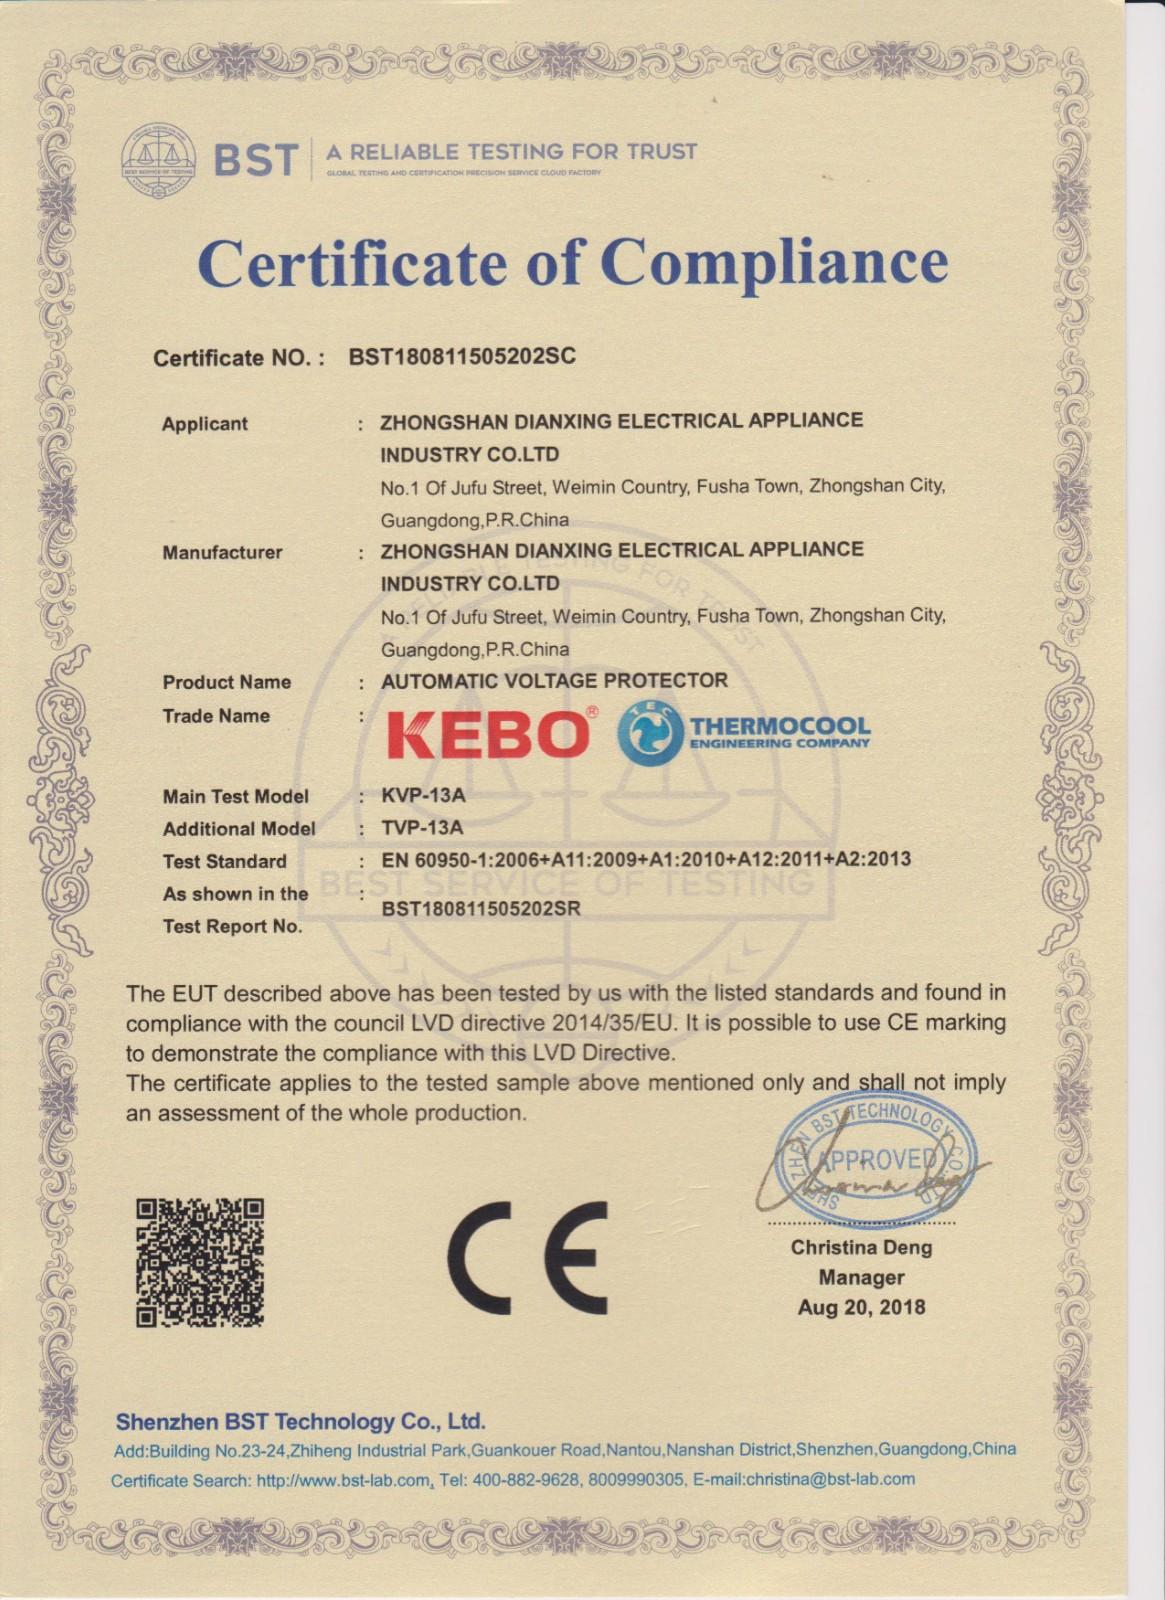 KEBO -Professional Power Protector Wall Plug Surge Protector Supplier-8